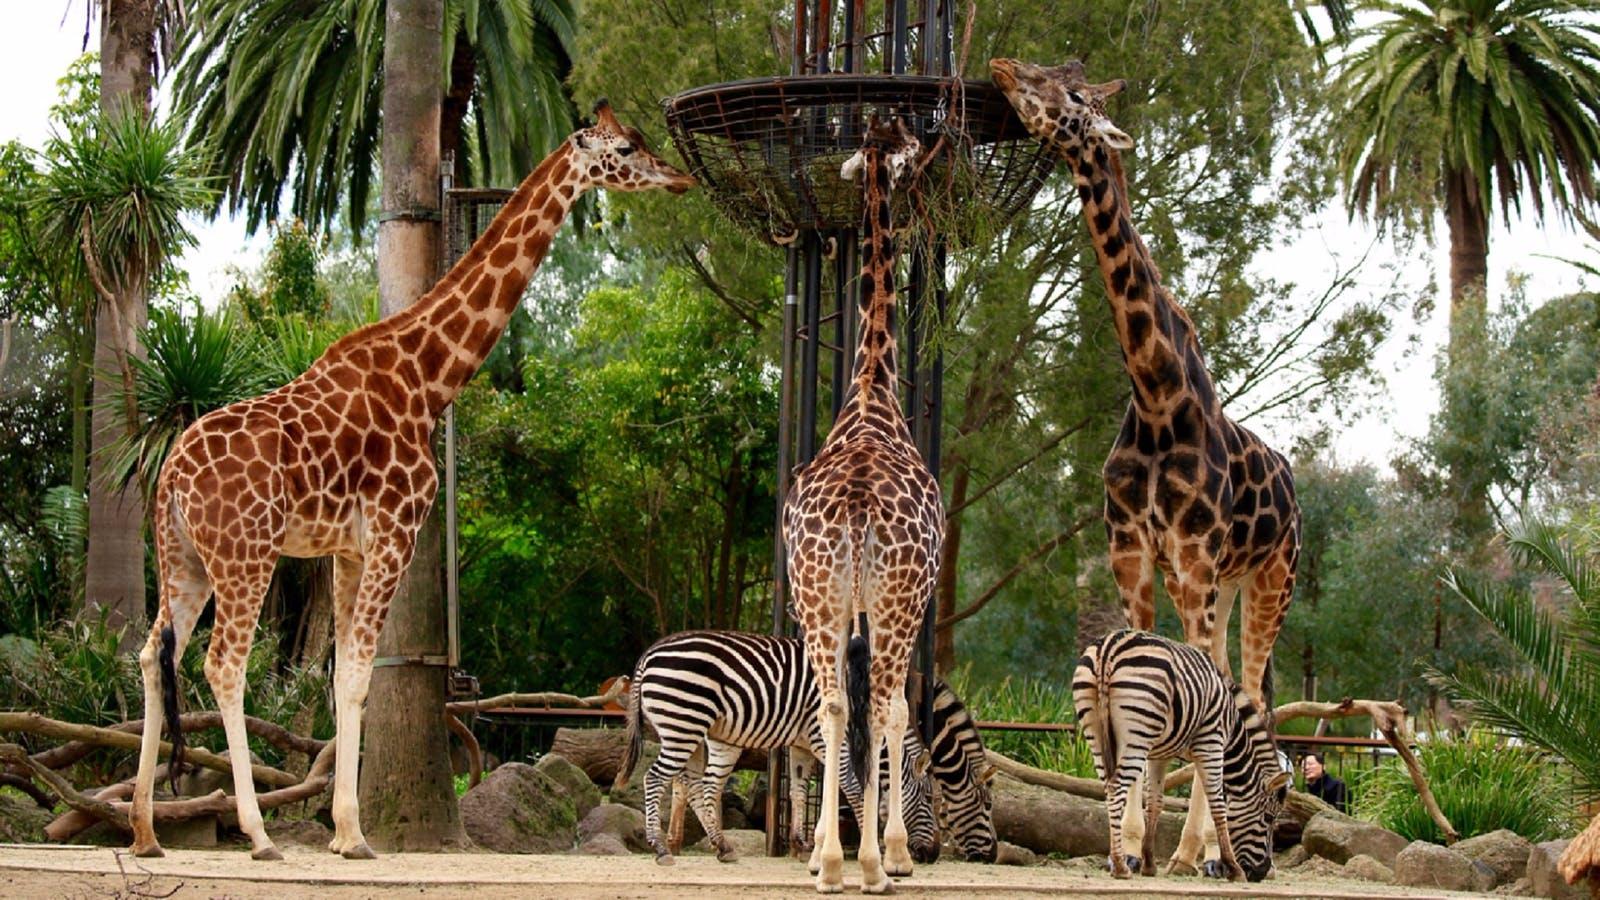 Giraffe viewing platform